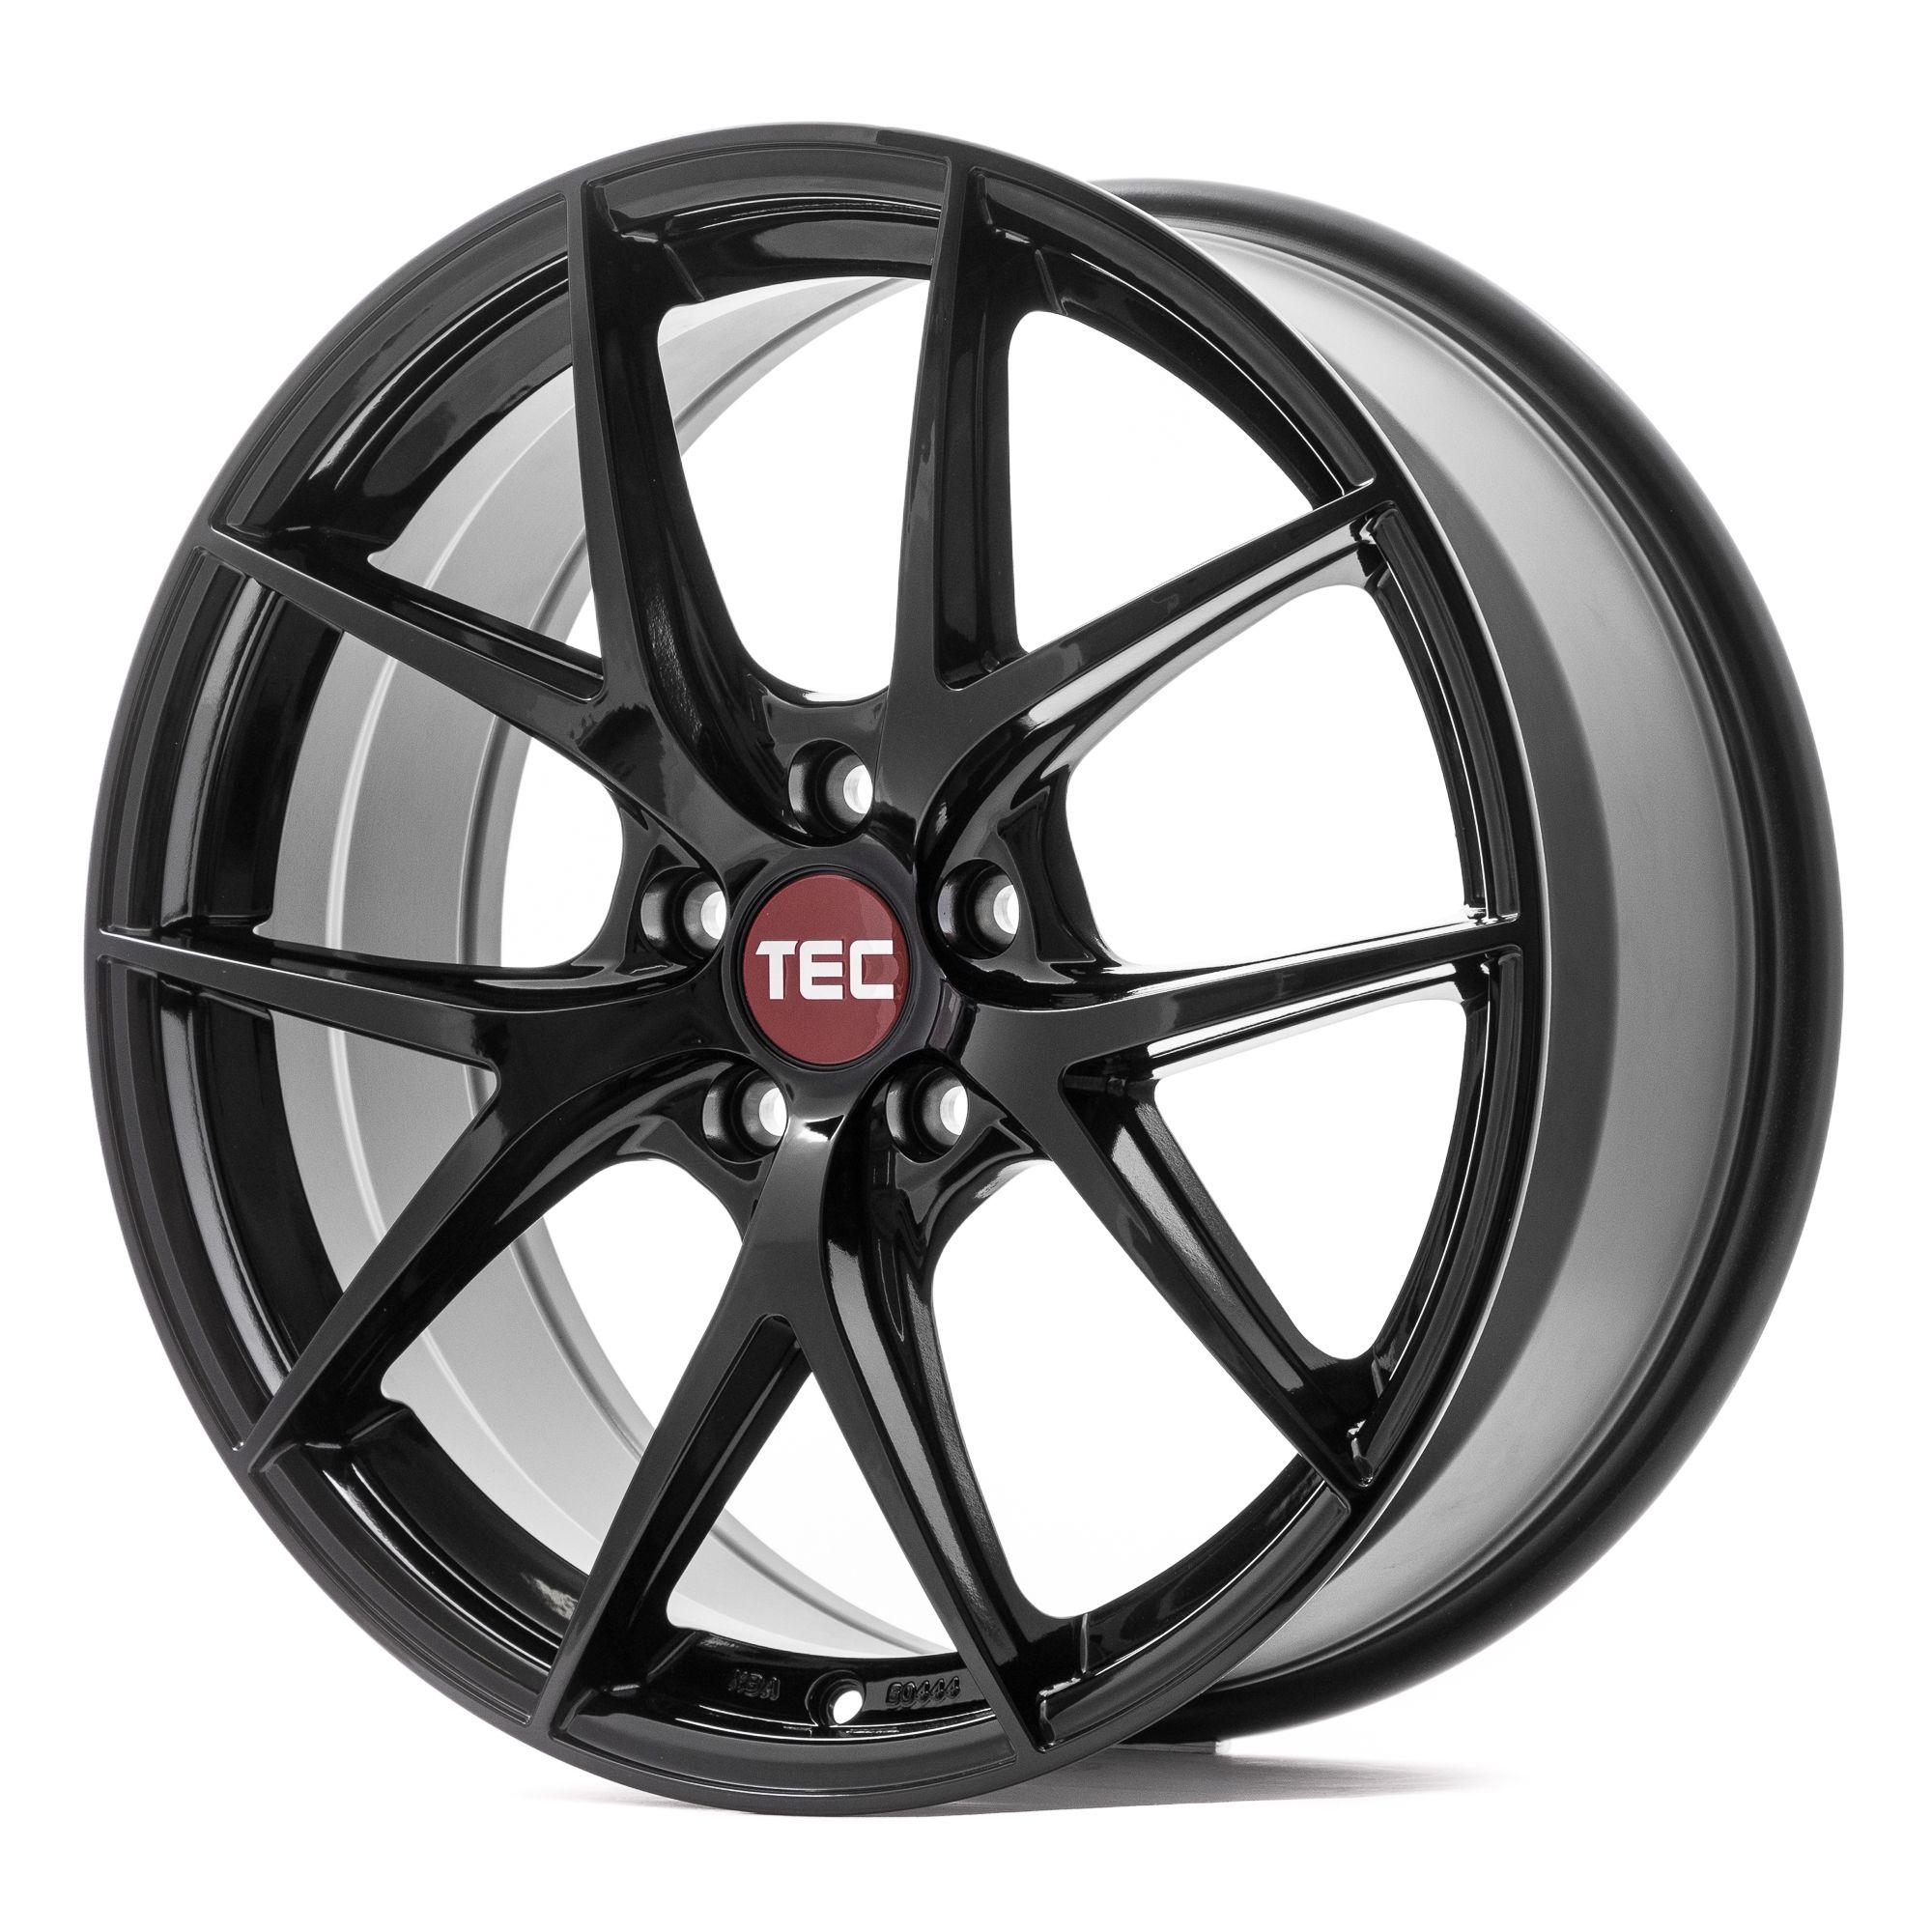 tec speedwheels gt6 evo felgen black glossy schwarz in. Black Bedroom Furniture Sets. Home Design Ideas